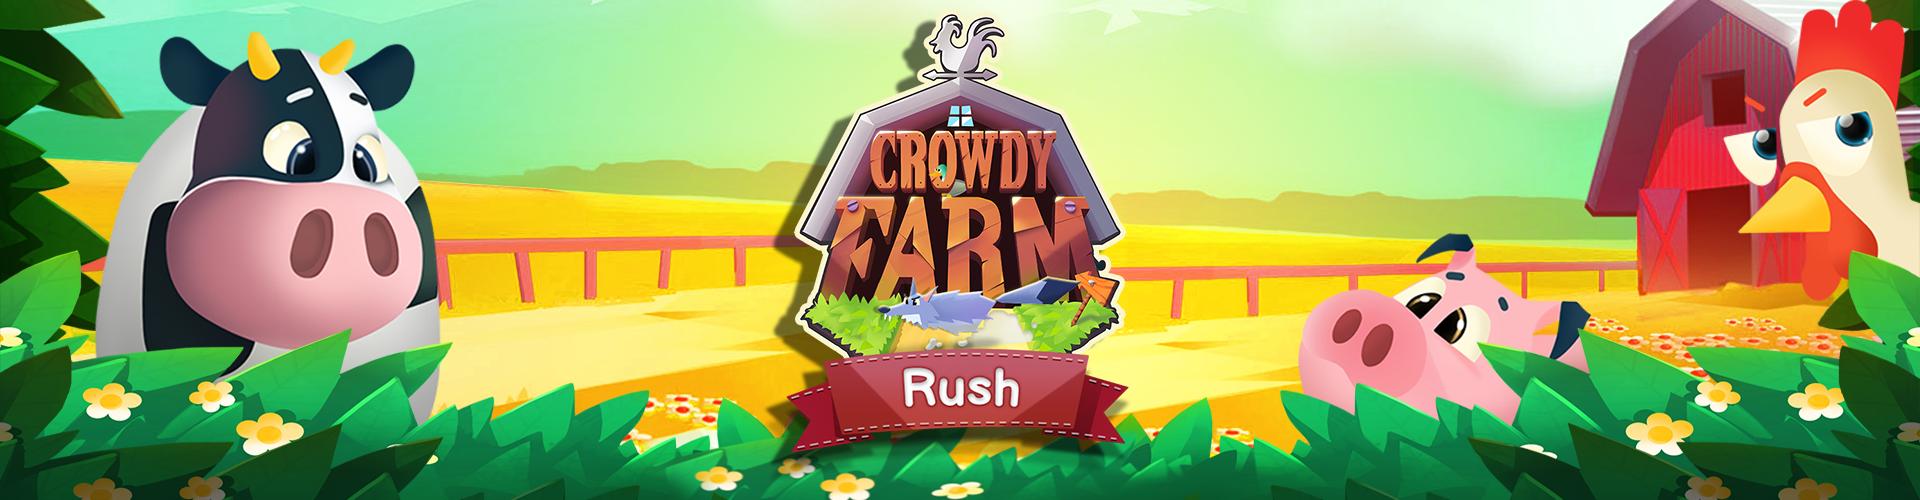 CF_Puzzle_Rush_7lvls_web